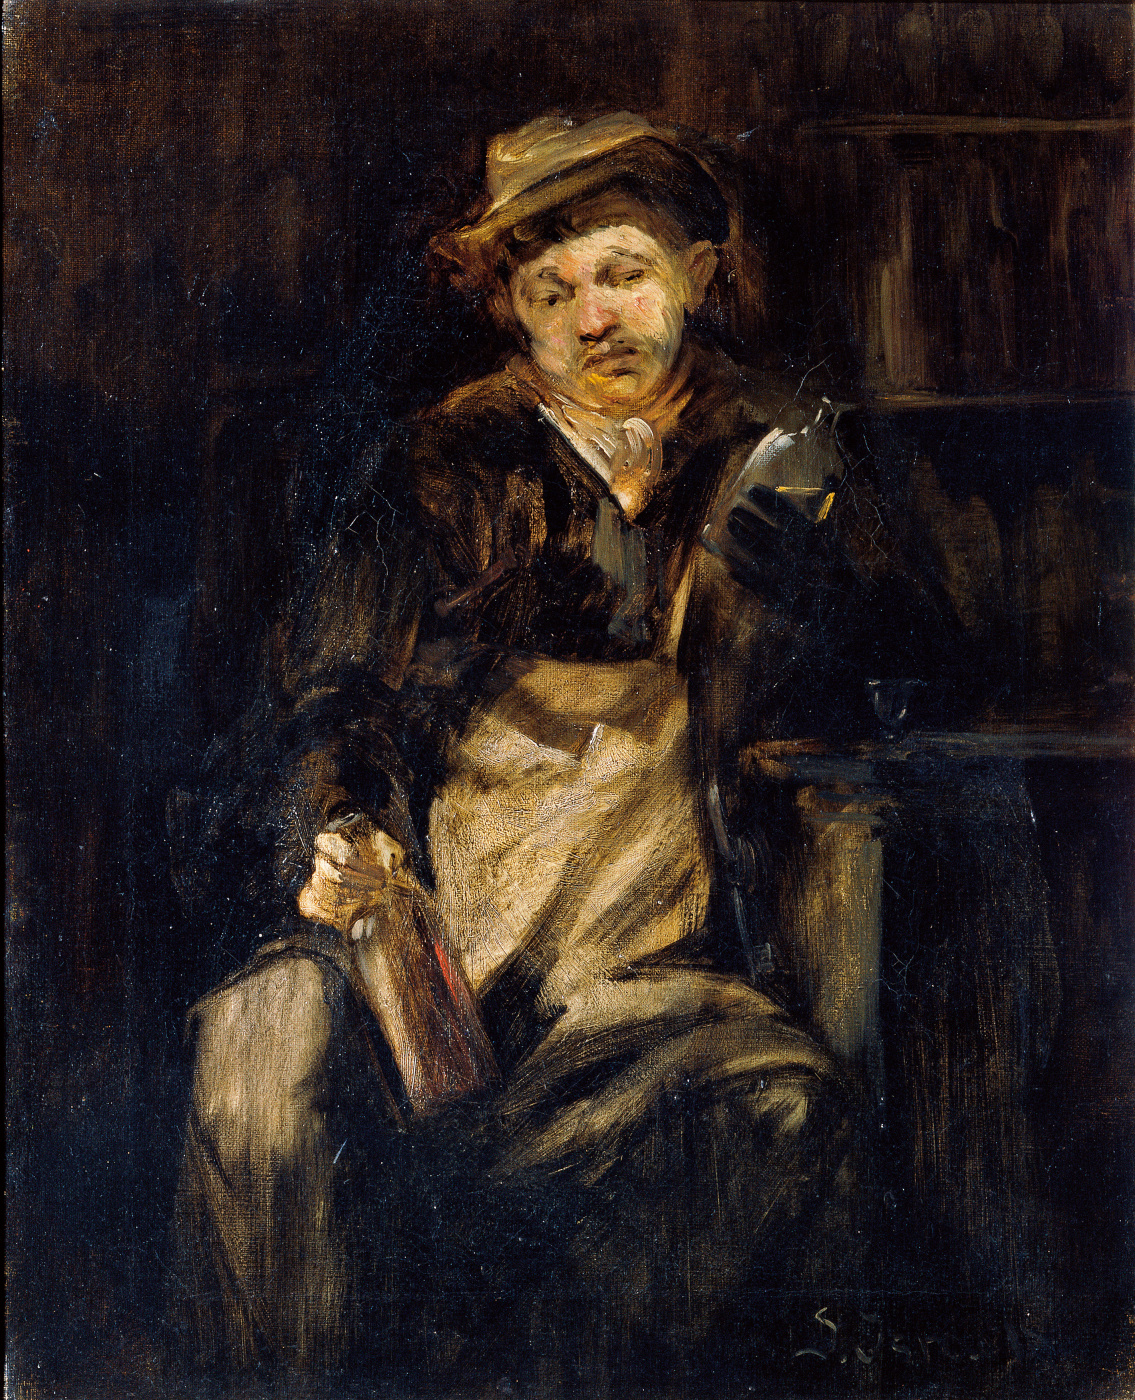 Joseph Israel. Drunkard